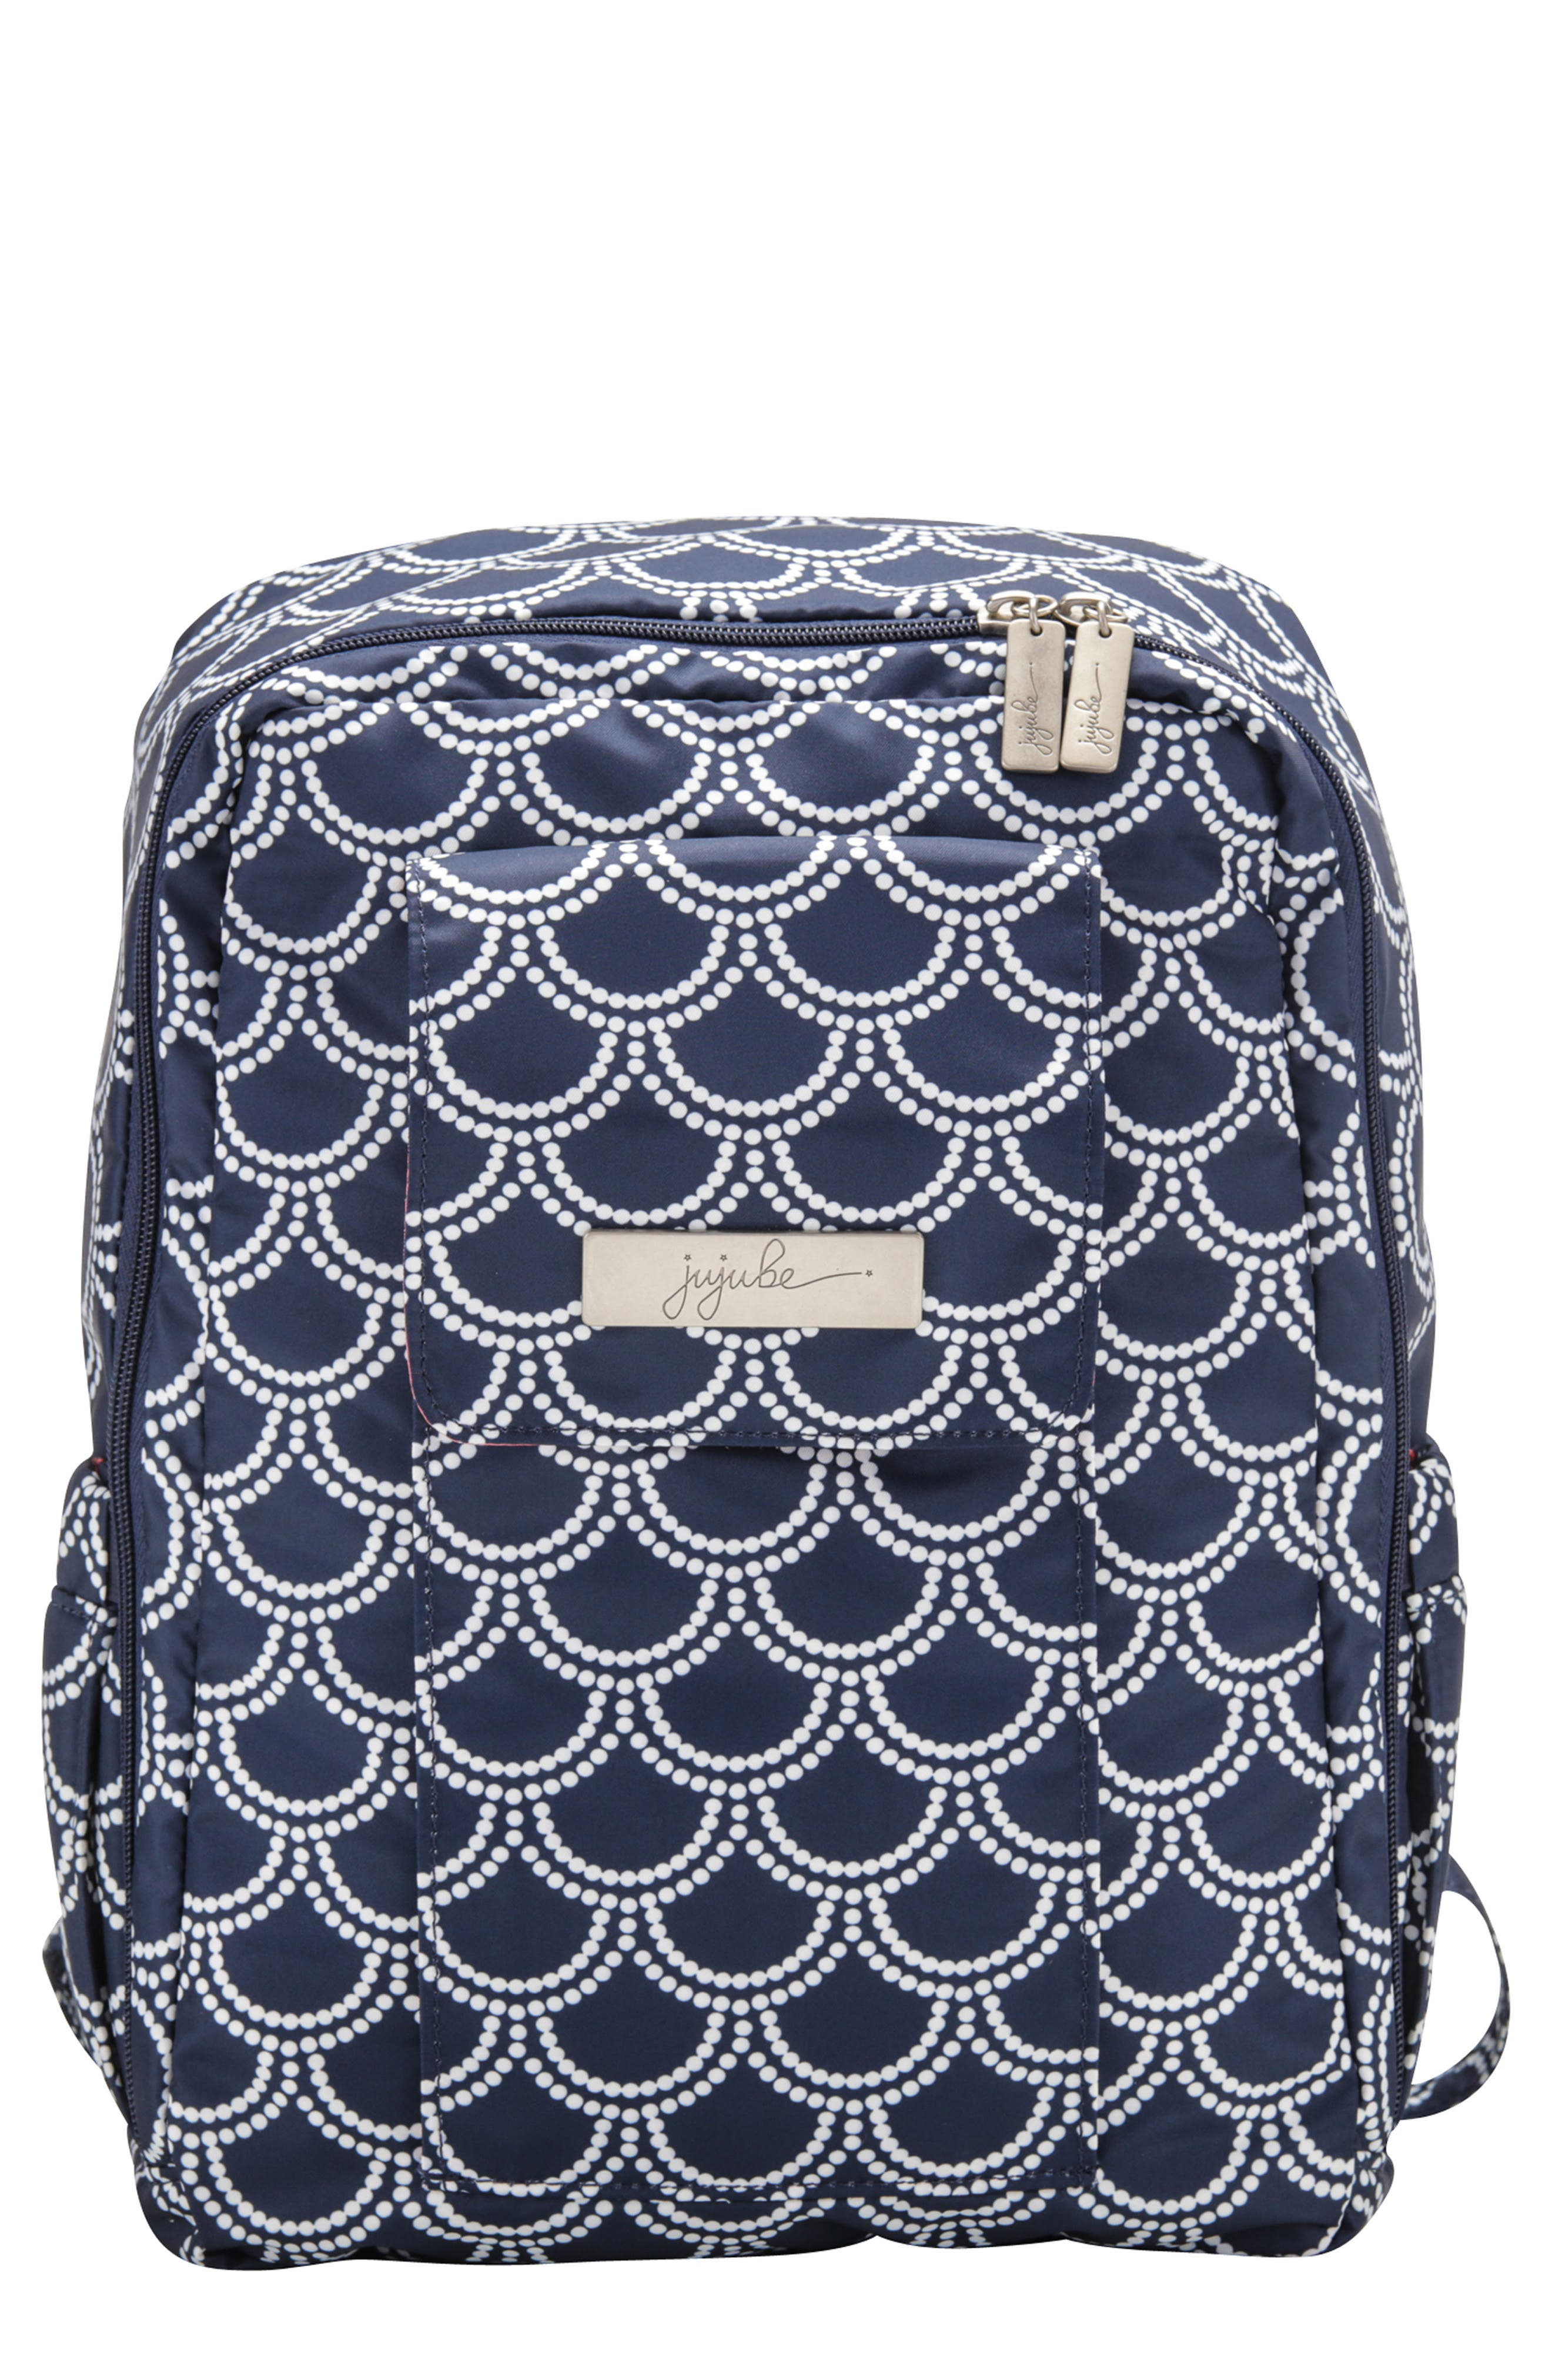 Alternate Image 1 Selected - Ju-Ju-Be Mini Be - Coastal Collection Diaper Backpack